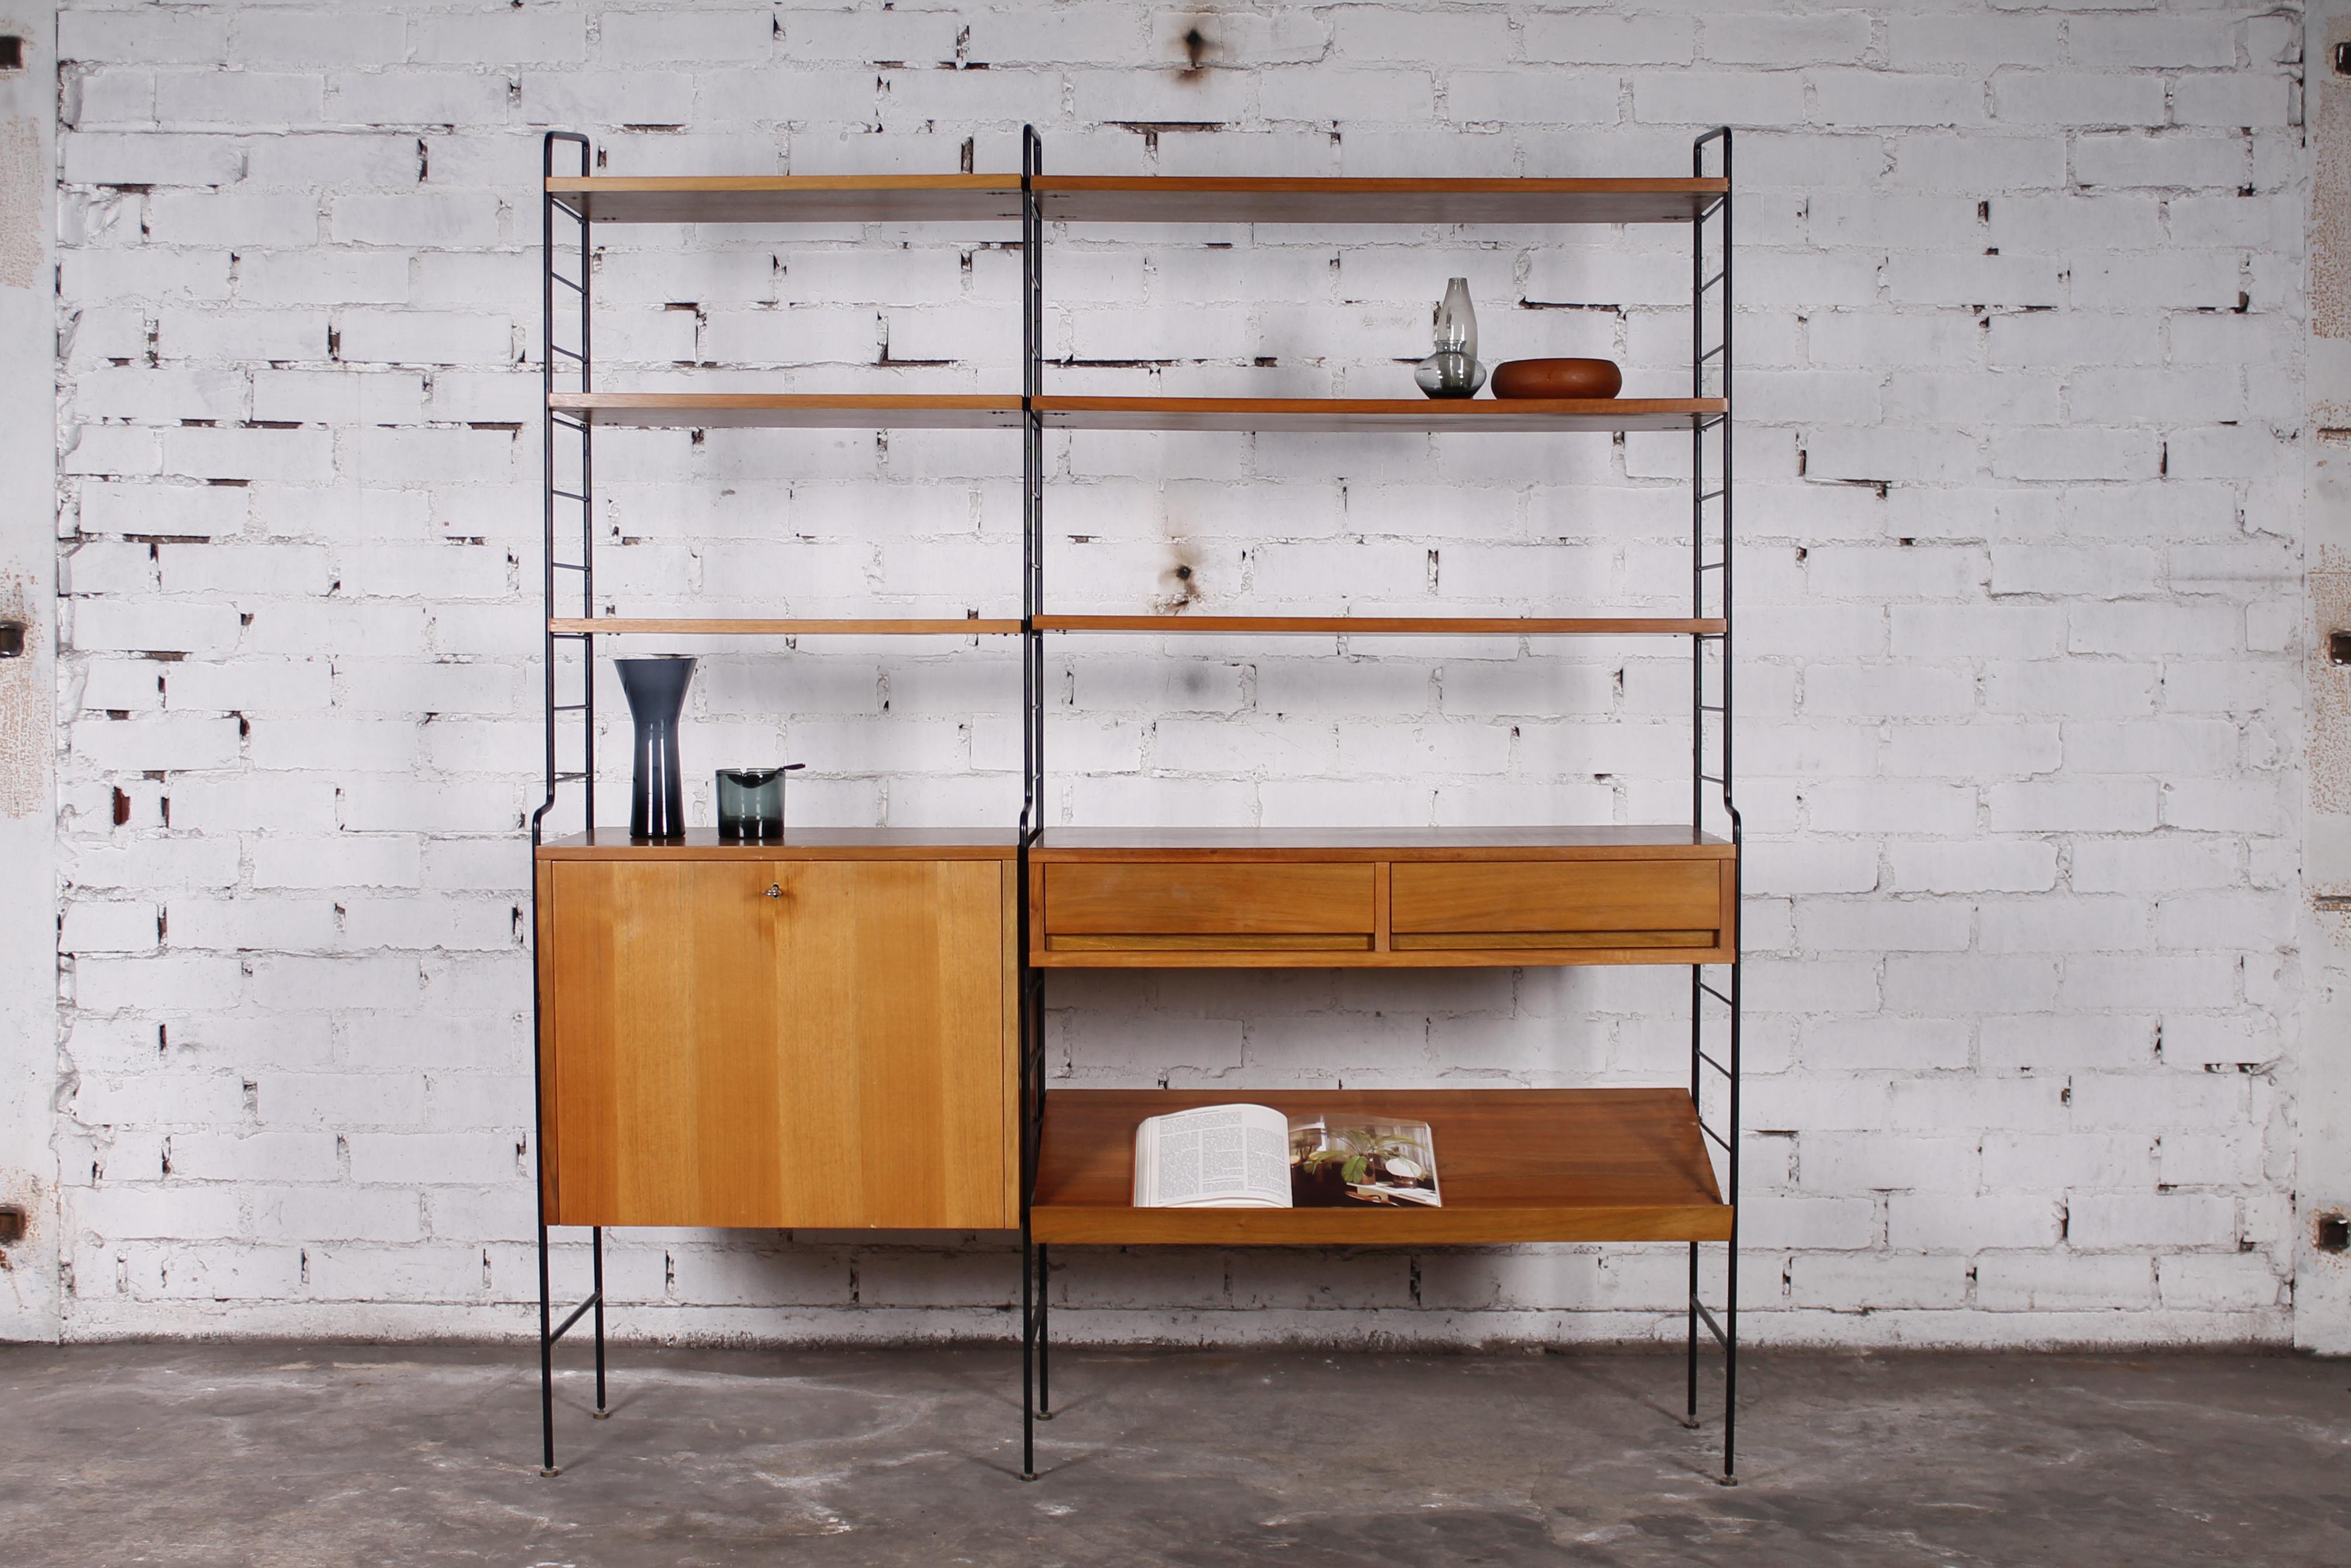 freistehendes modulares string regal nussbaum metall 1960er hans hans. Black Bedroom Furniture Sets. Home Design Ideas